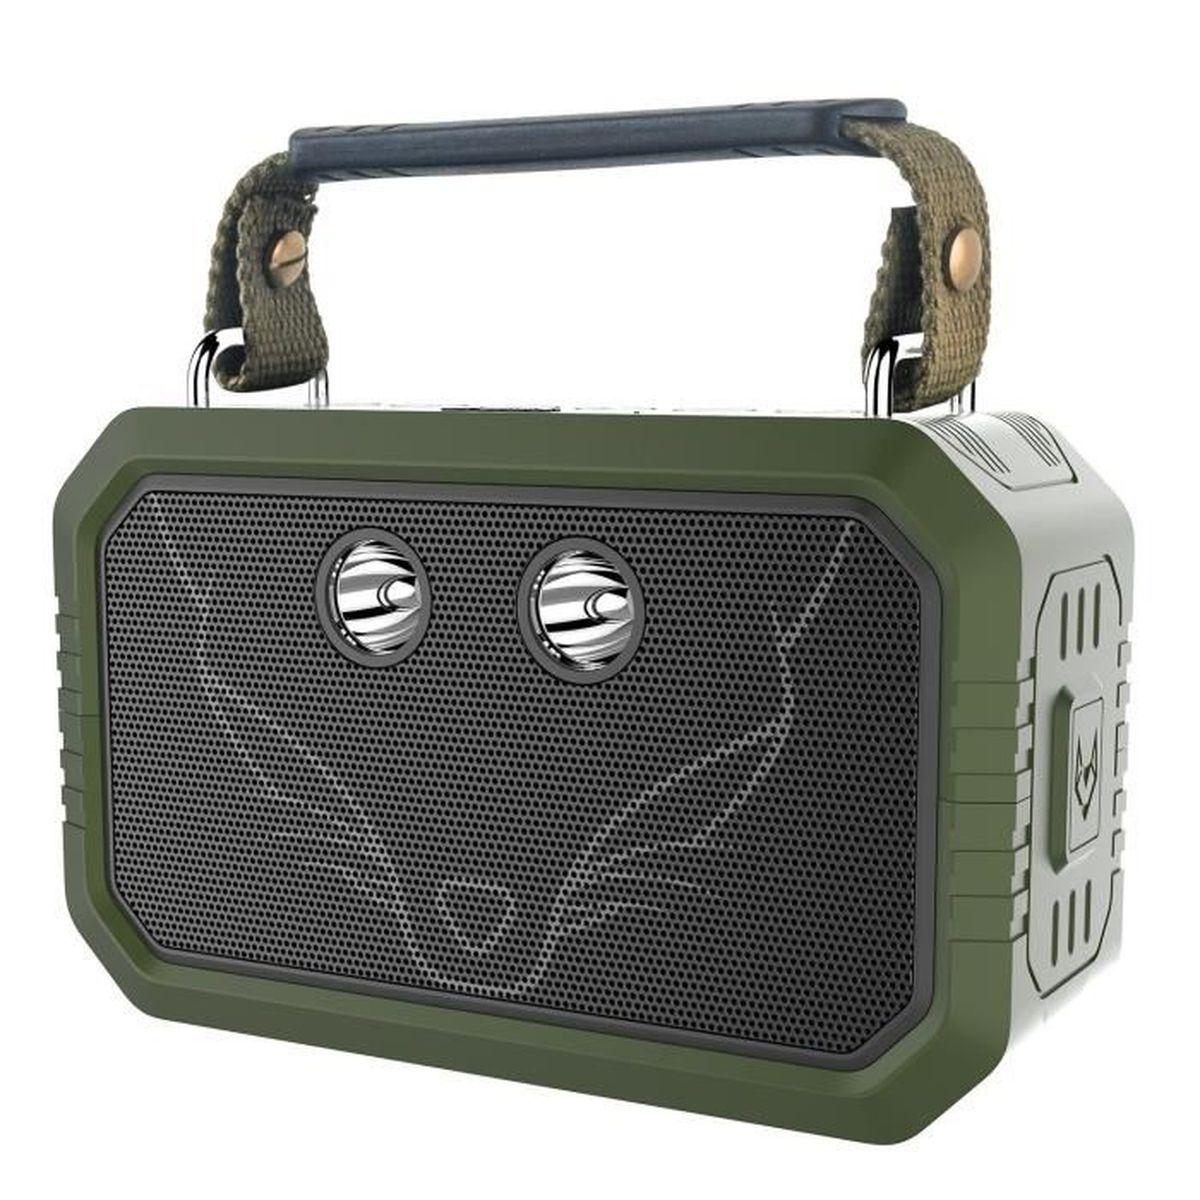 ENCEINTE NOMADE Enceinte Bluetooth, DOSS Traveler 20W Stéréo Sans